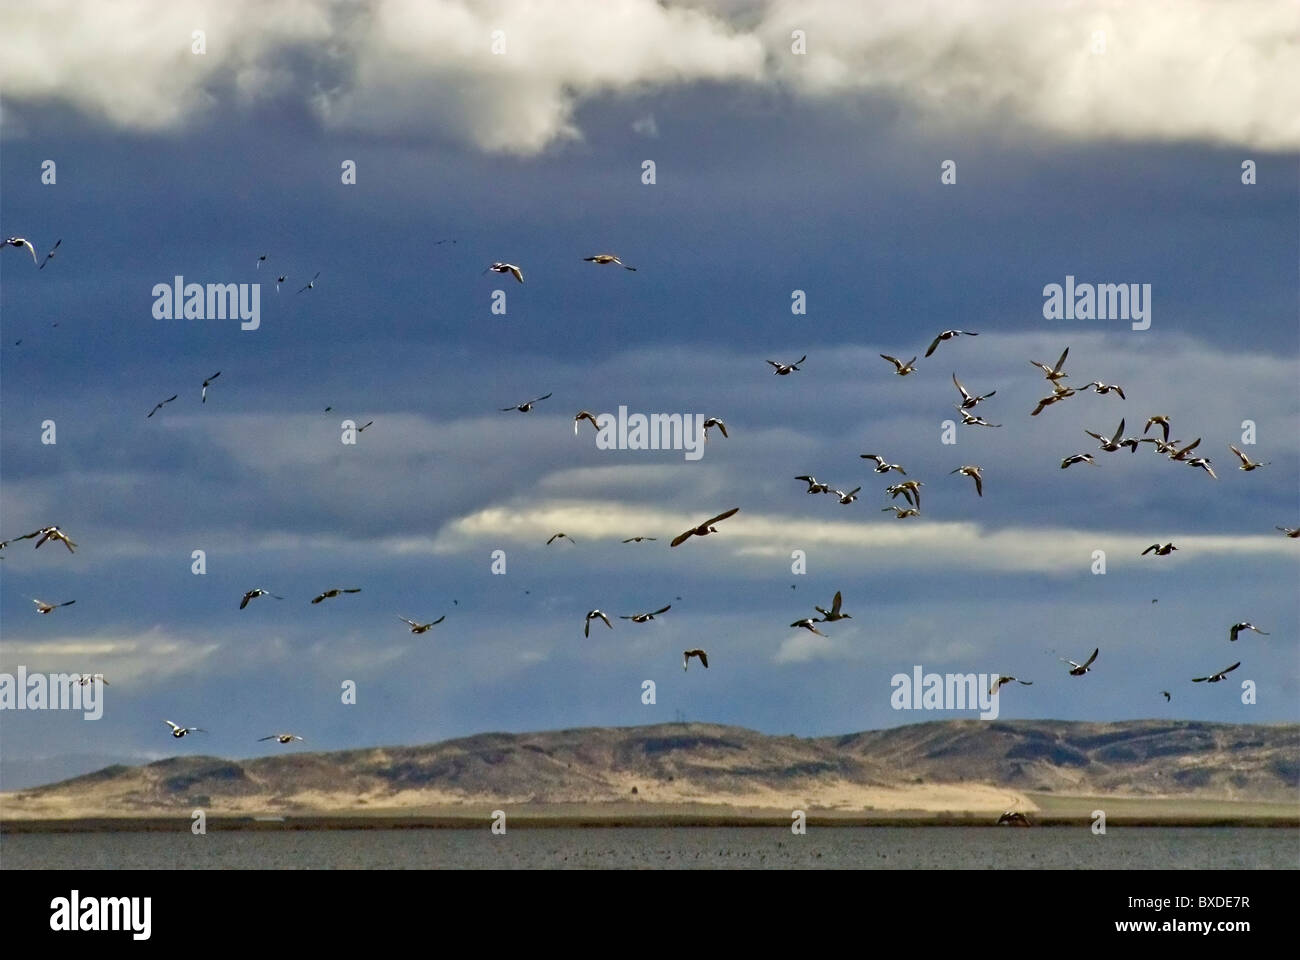 Flight of birds in March at Lower Klamath National Wildlife Refuge, California, USA - Stock Image